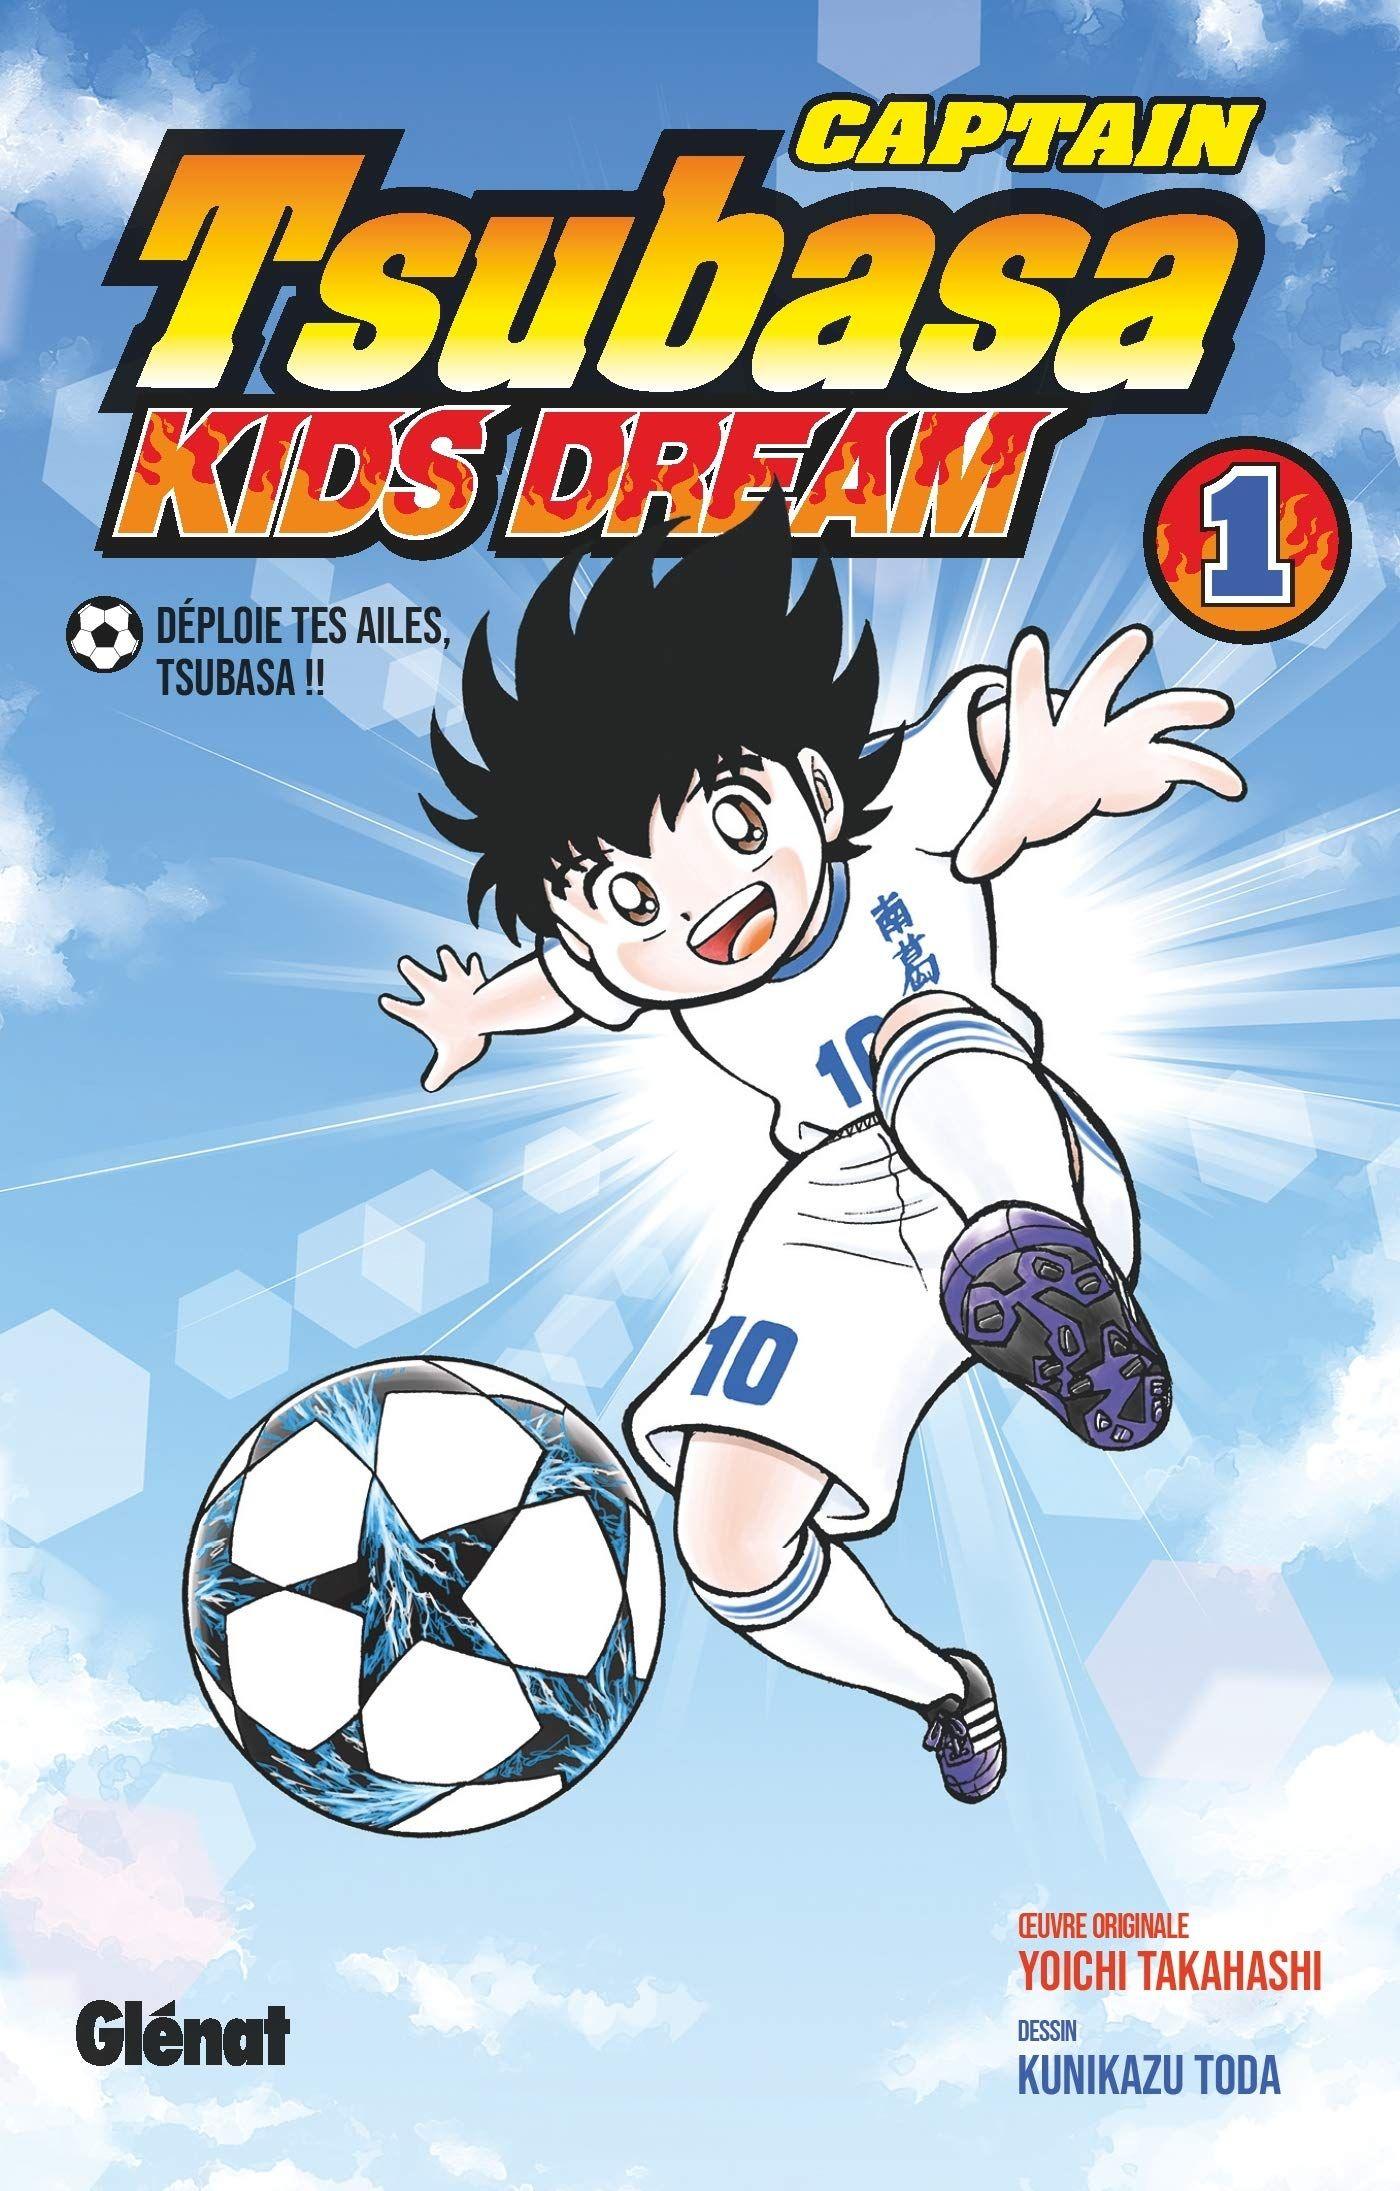 Manga - Captain Tsubasa - Kids Dream